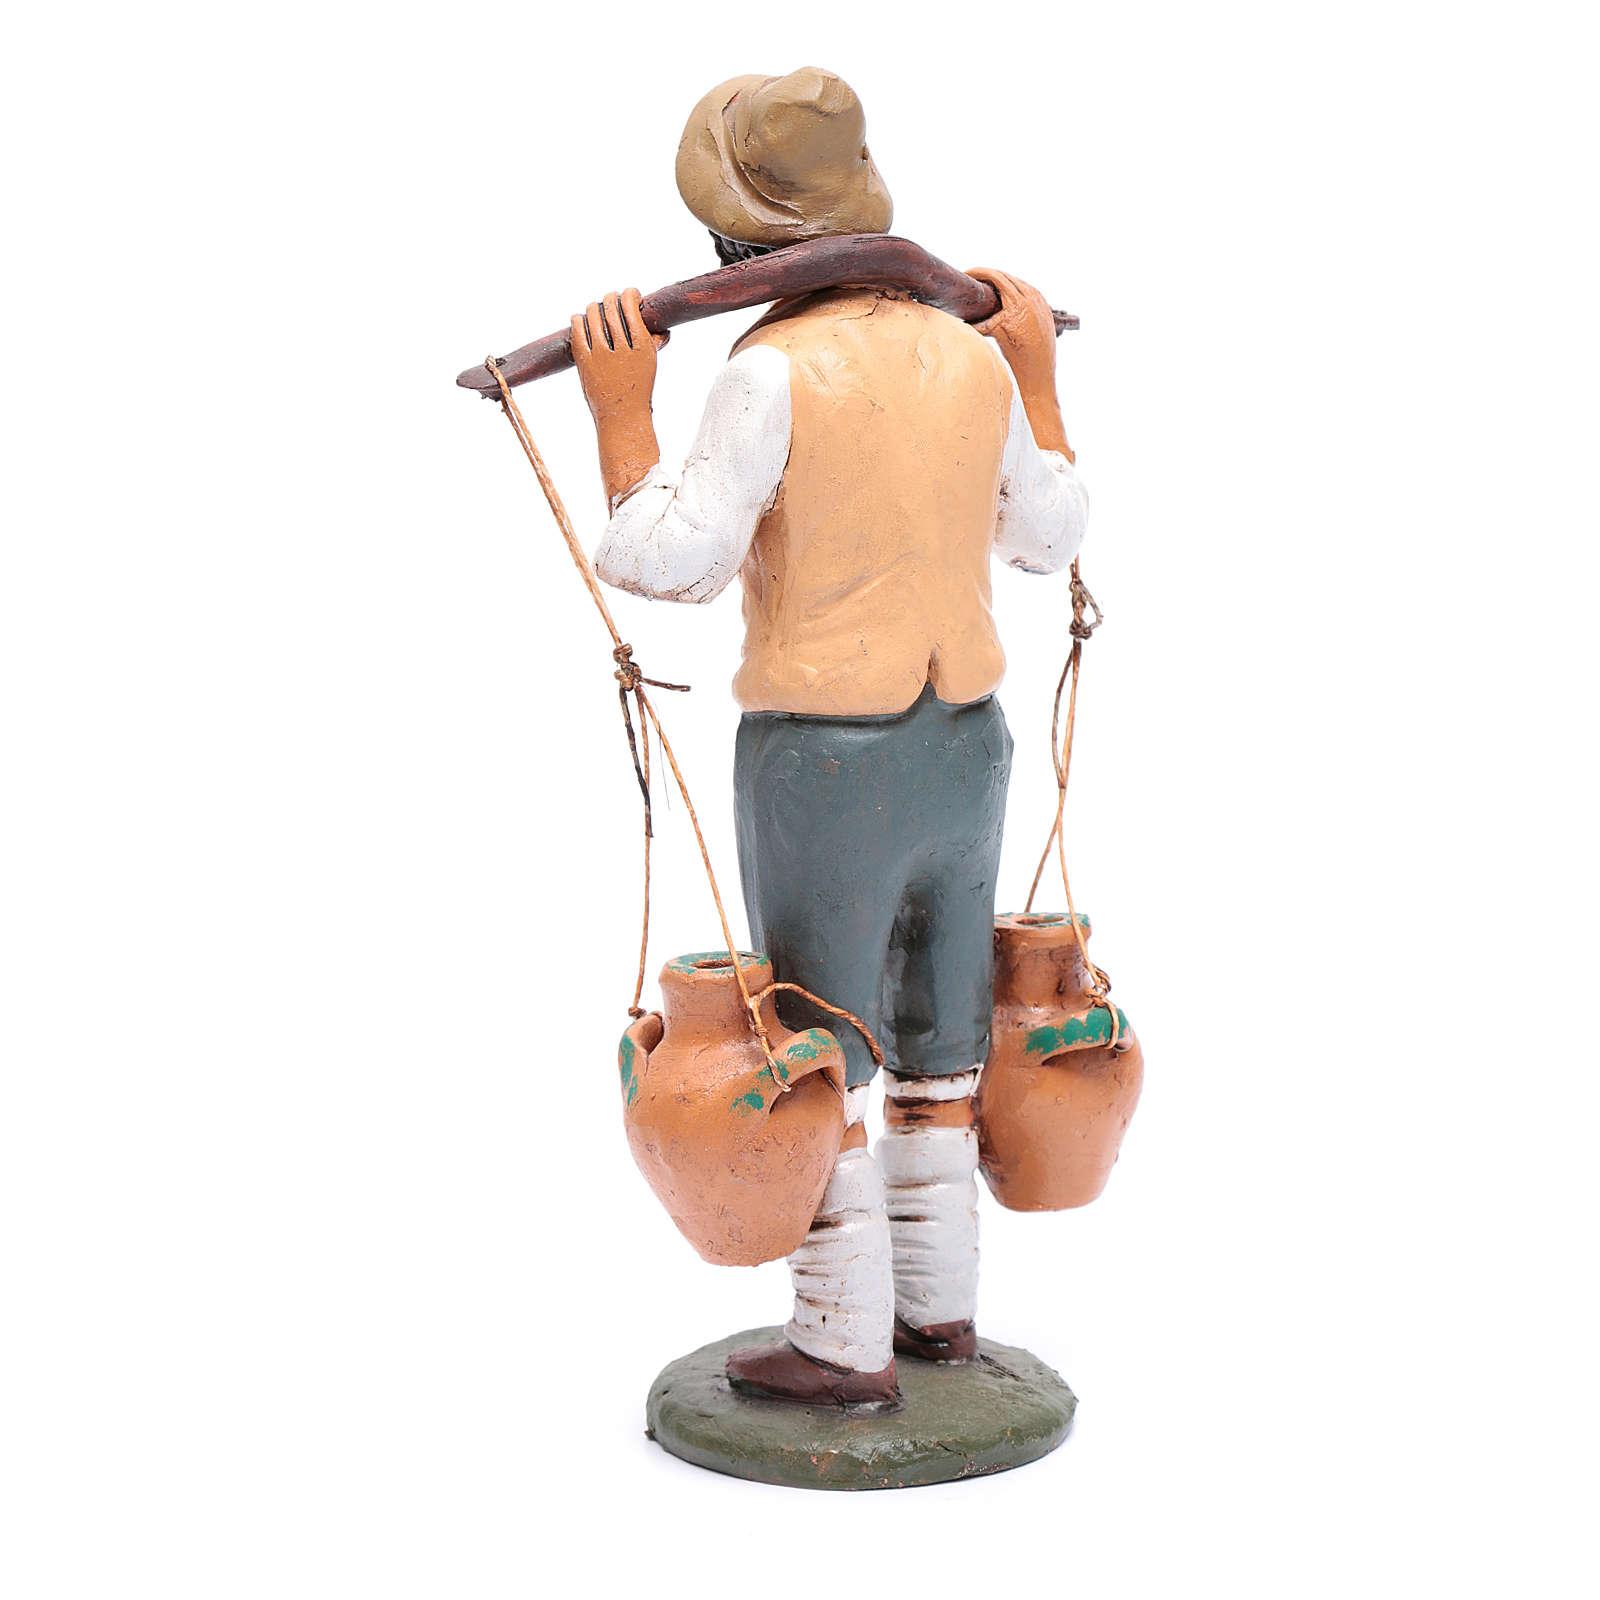 Uomo porta acqua presepe Deruta 30 cm in terracotta 4